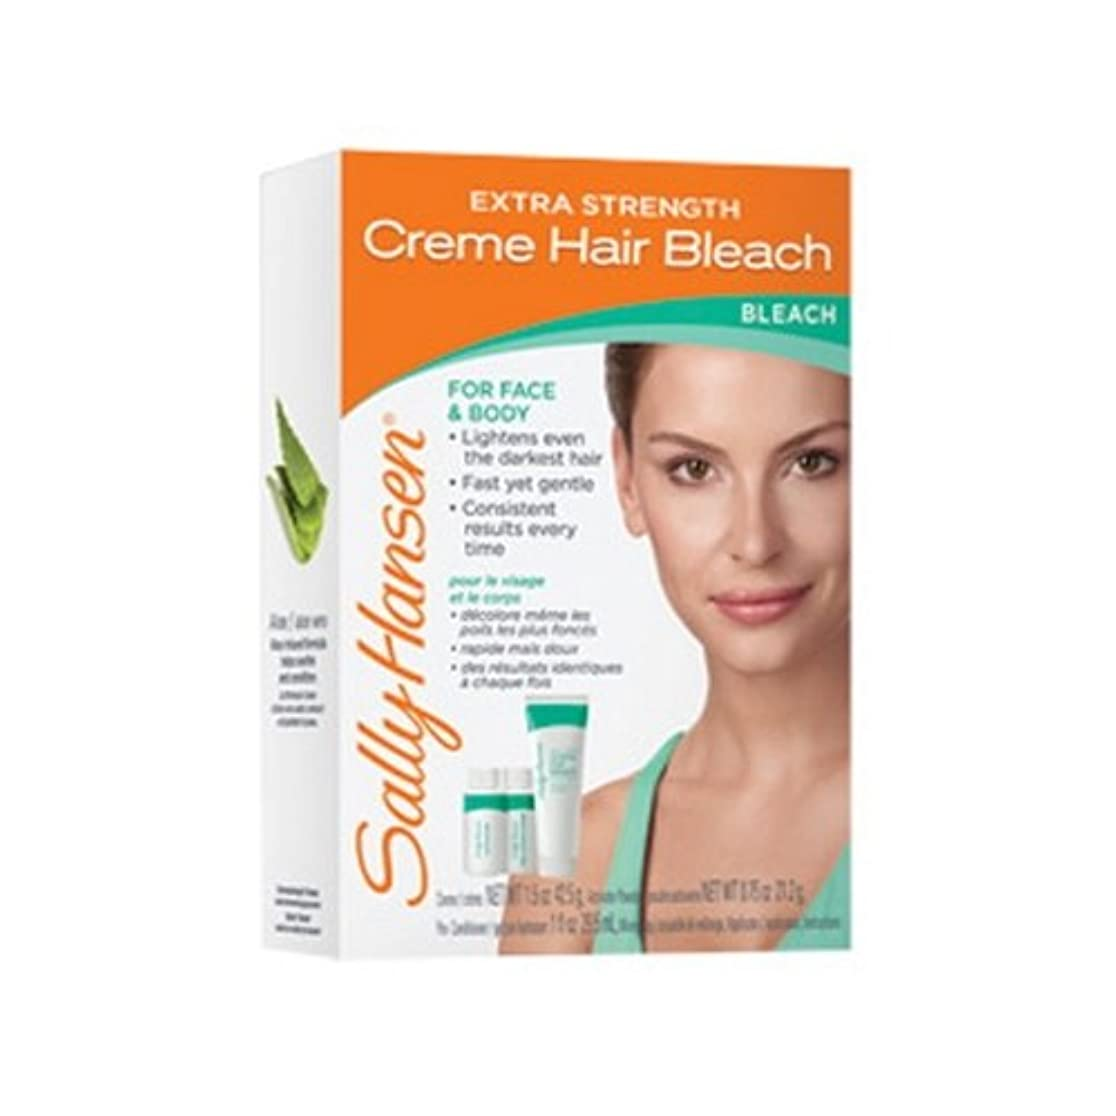 読者大胆な検査SALLY HANSEN Extra Strength Creme Hair Bleach for Face & Body - SH2010 (並行輸入品)